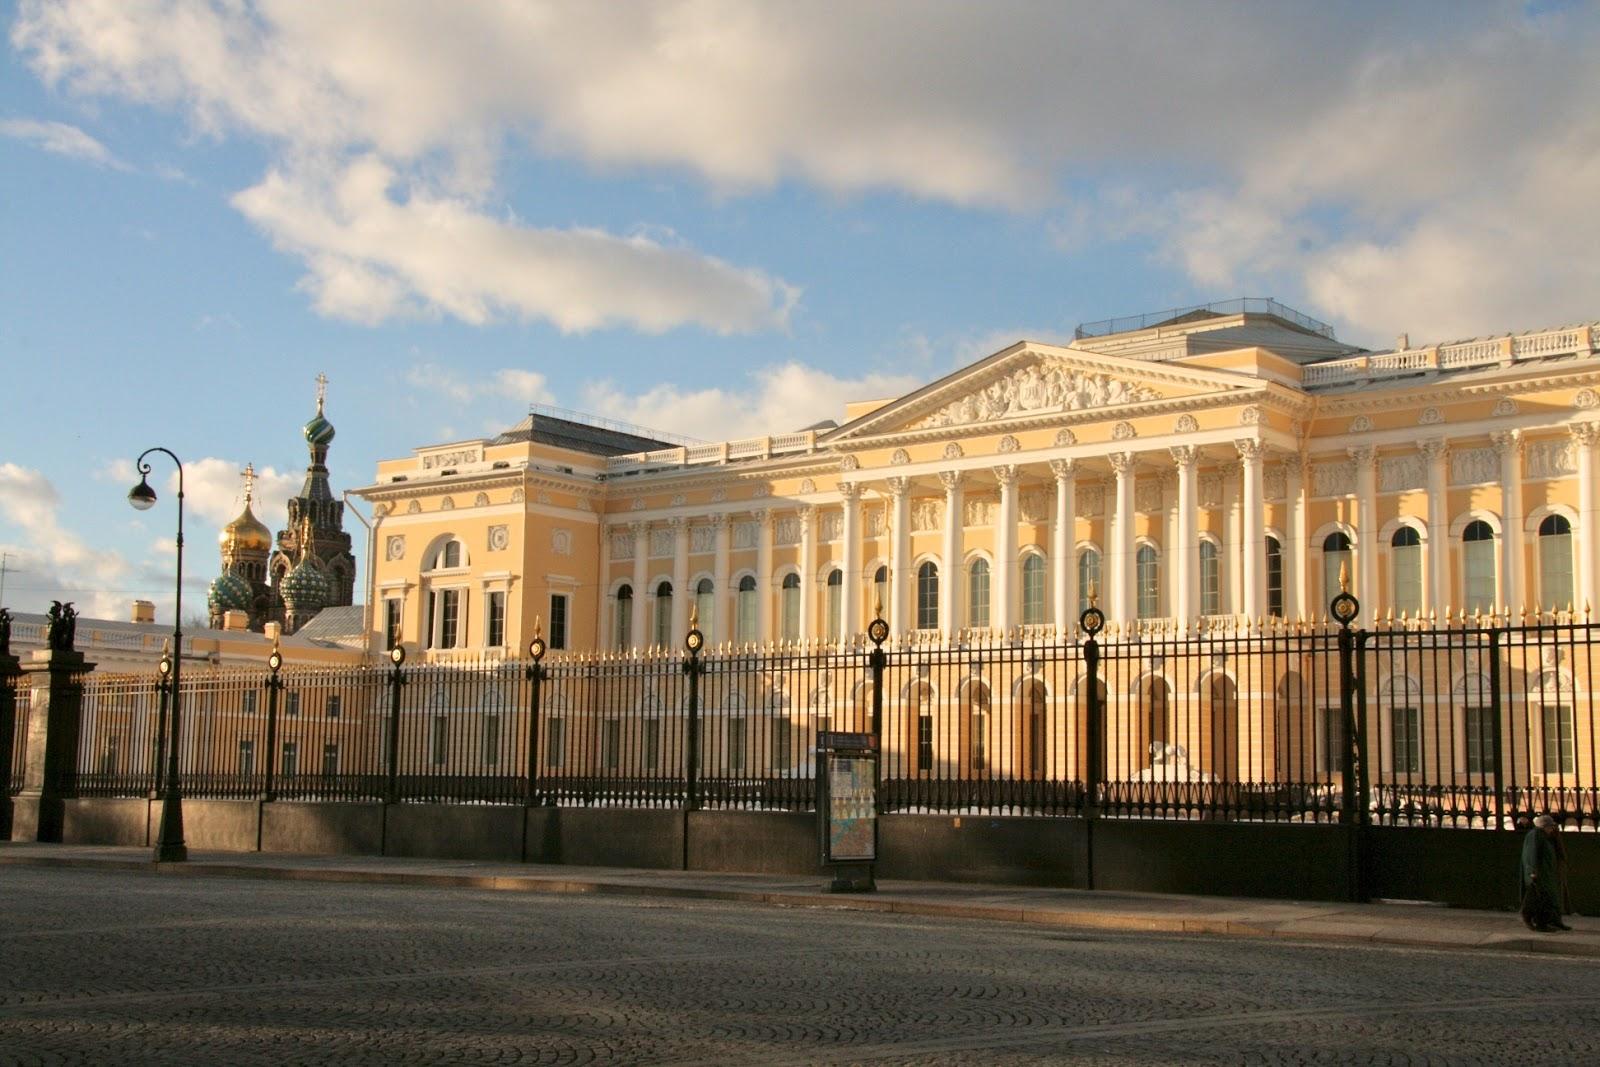 Russische partnervermittlung st. petersburg